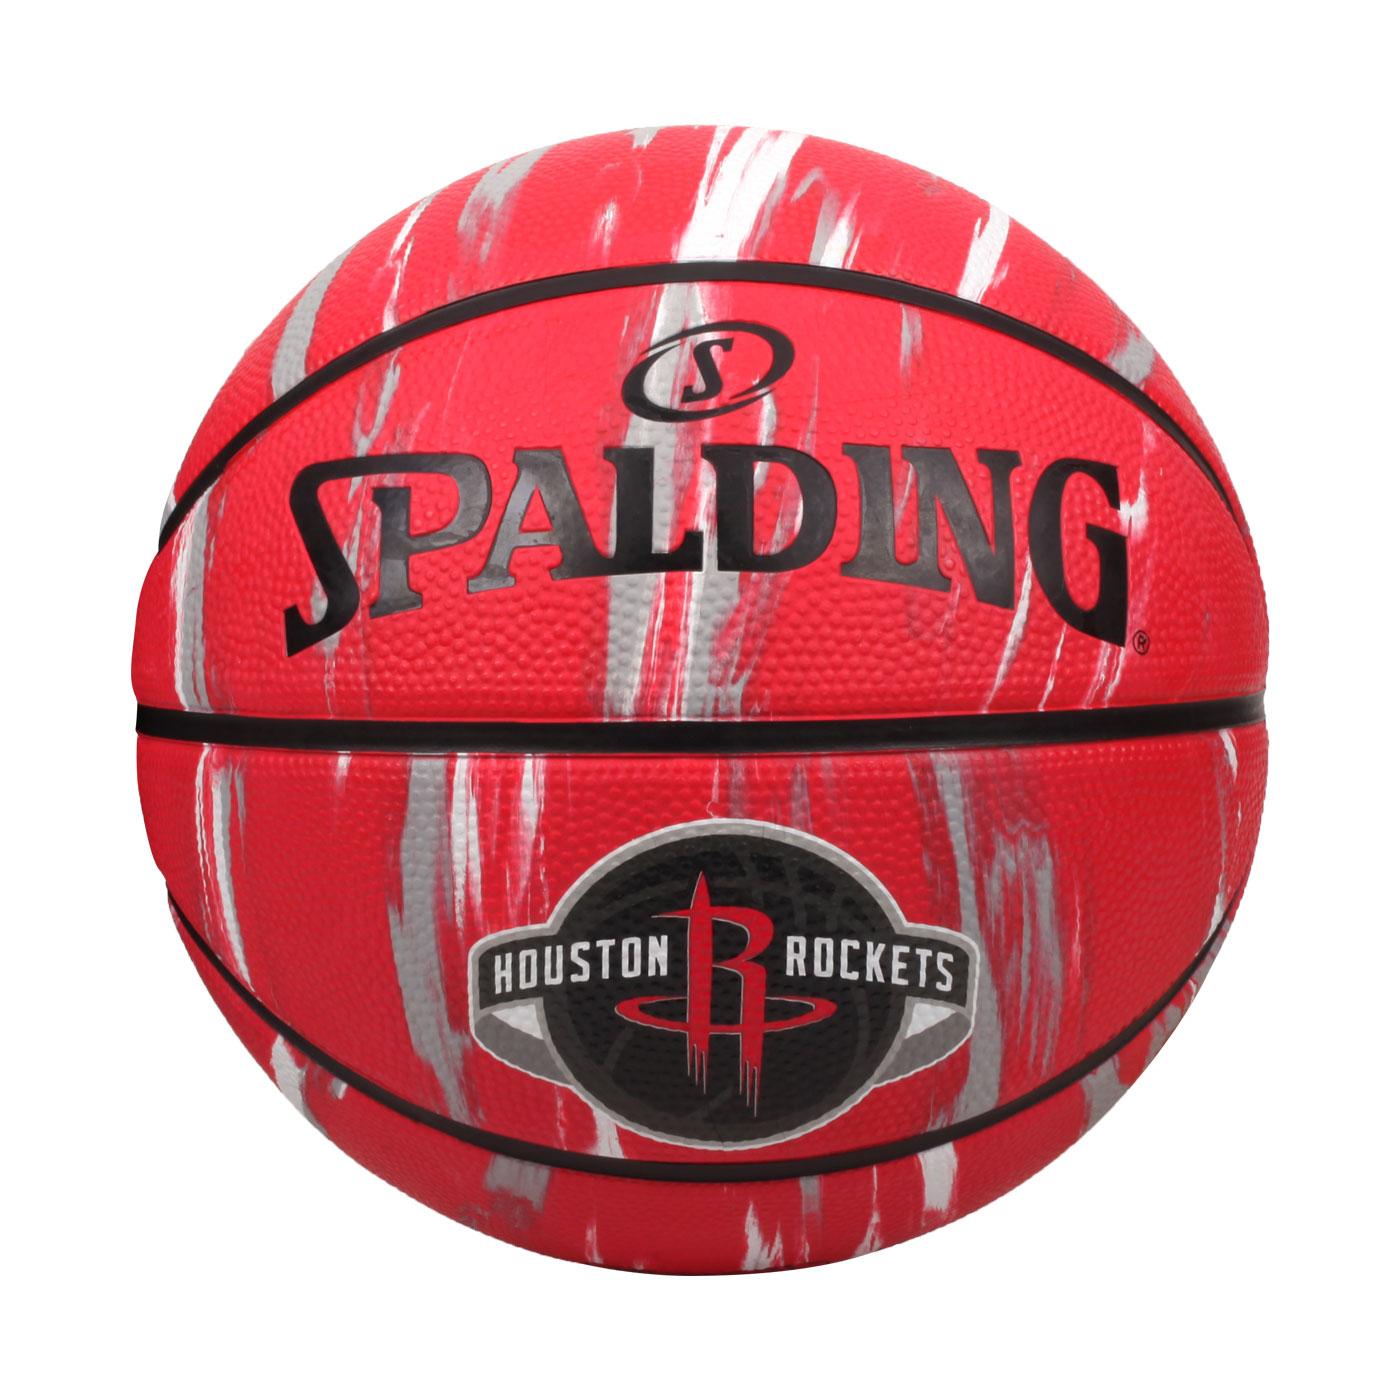 SPALDING NBA隊徽-火箭 #7籃球 SPA39739 SPA84150